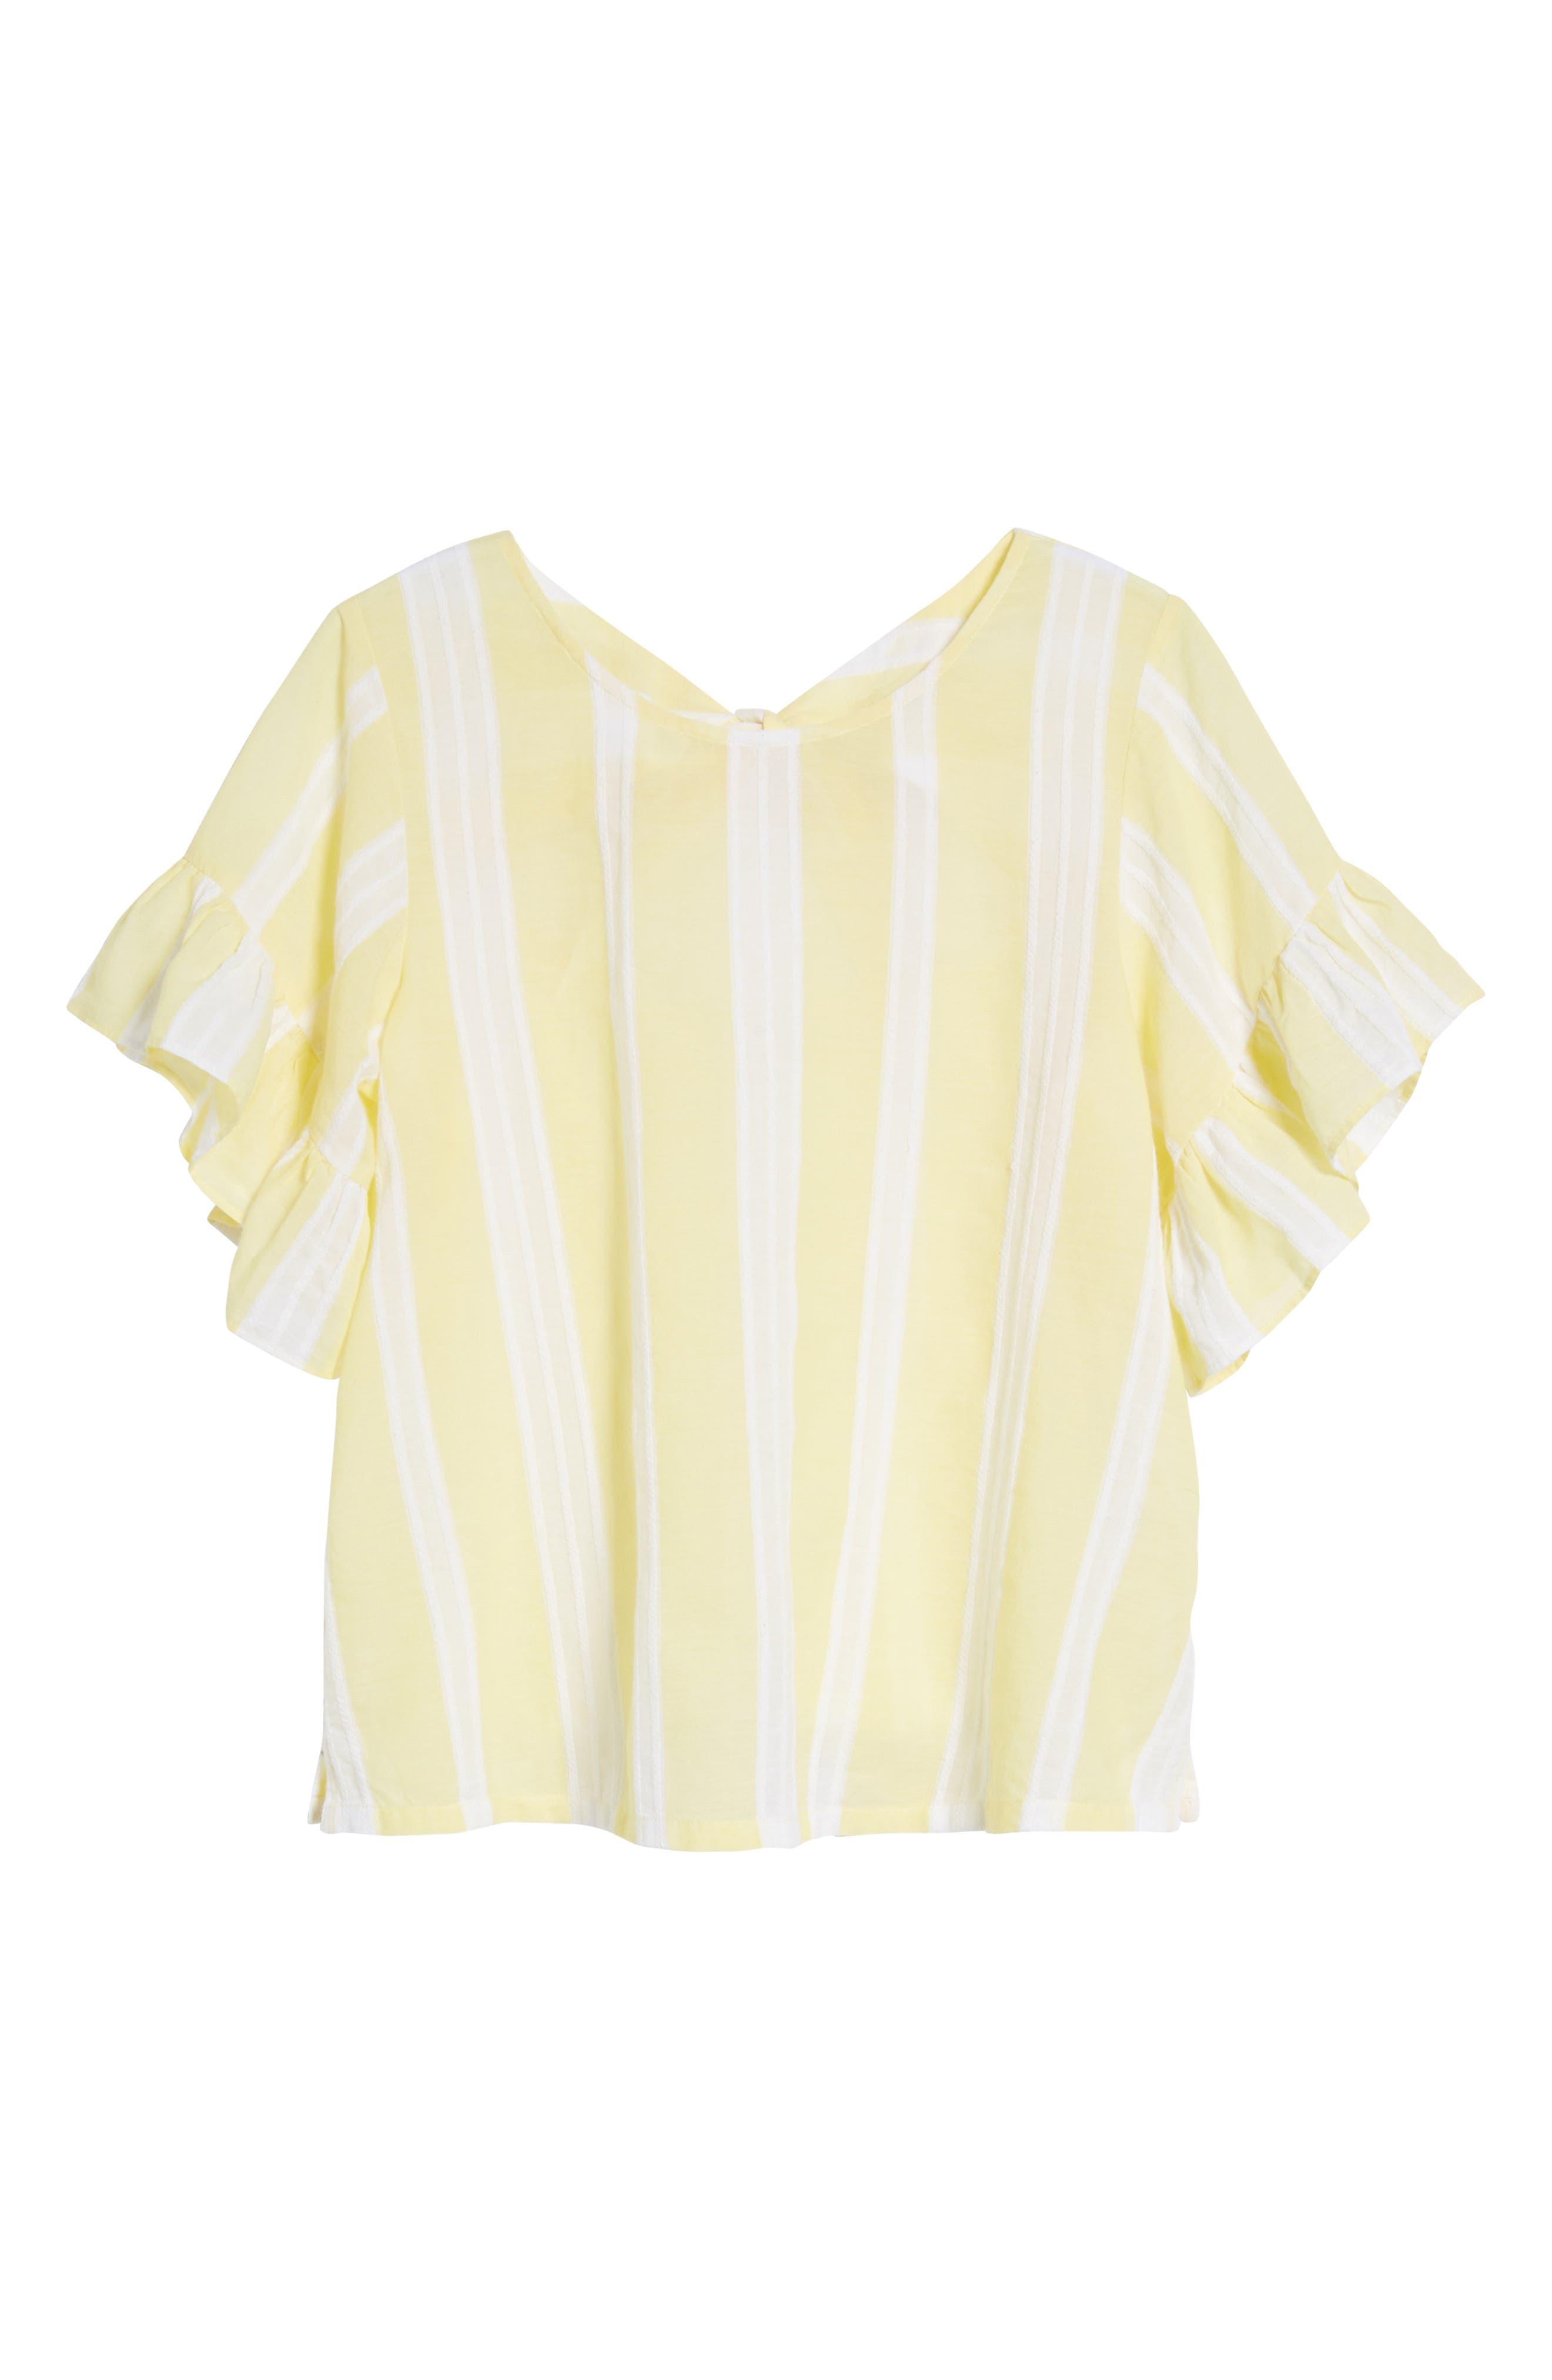 Stripe Tie Back Top,                             Alternate thumbnail 7, color,                             Yellow Glow Lena Stripe